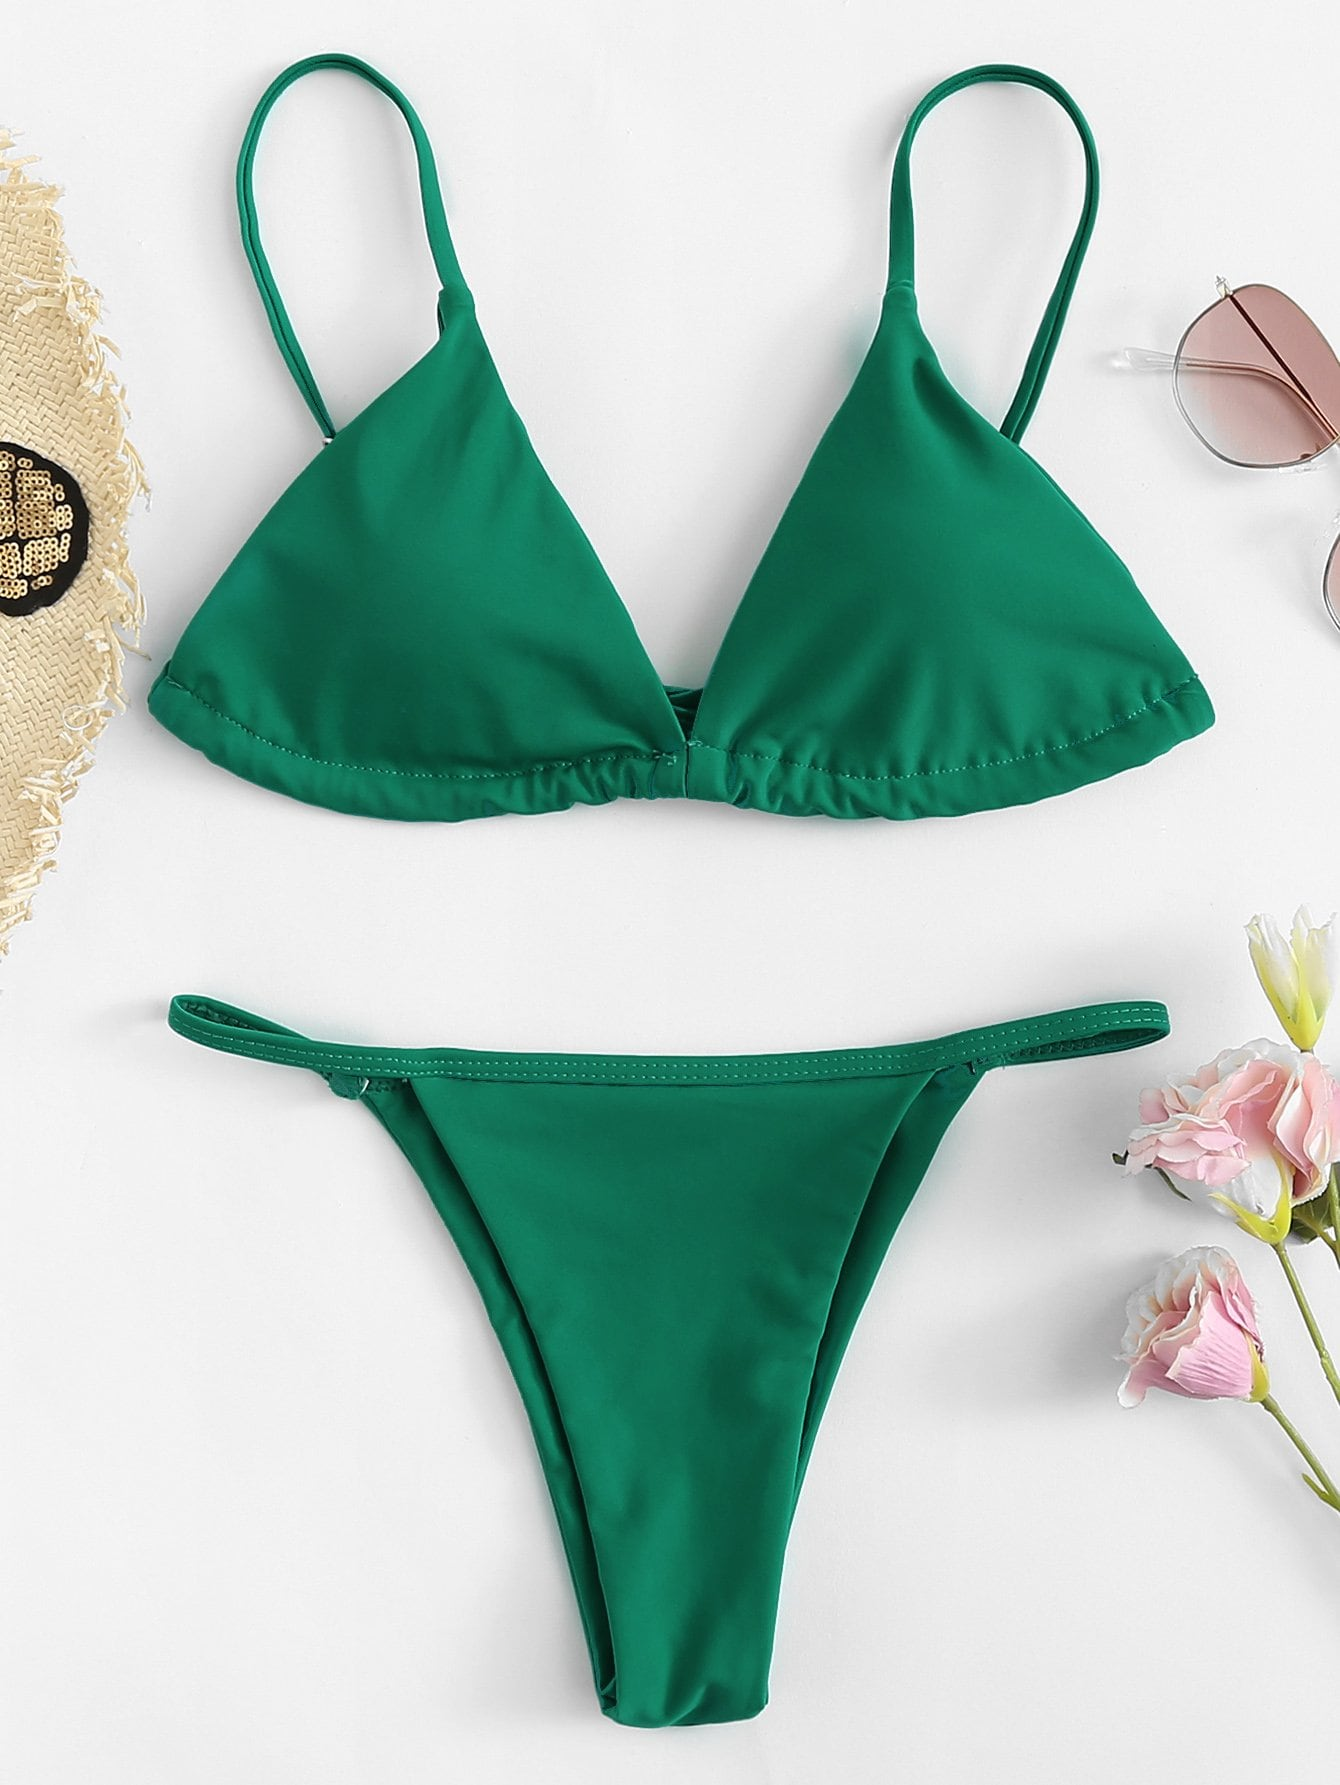 Halter Neck Triangle Bikini Set green halter v neck padded design triangle bikini